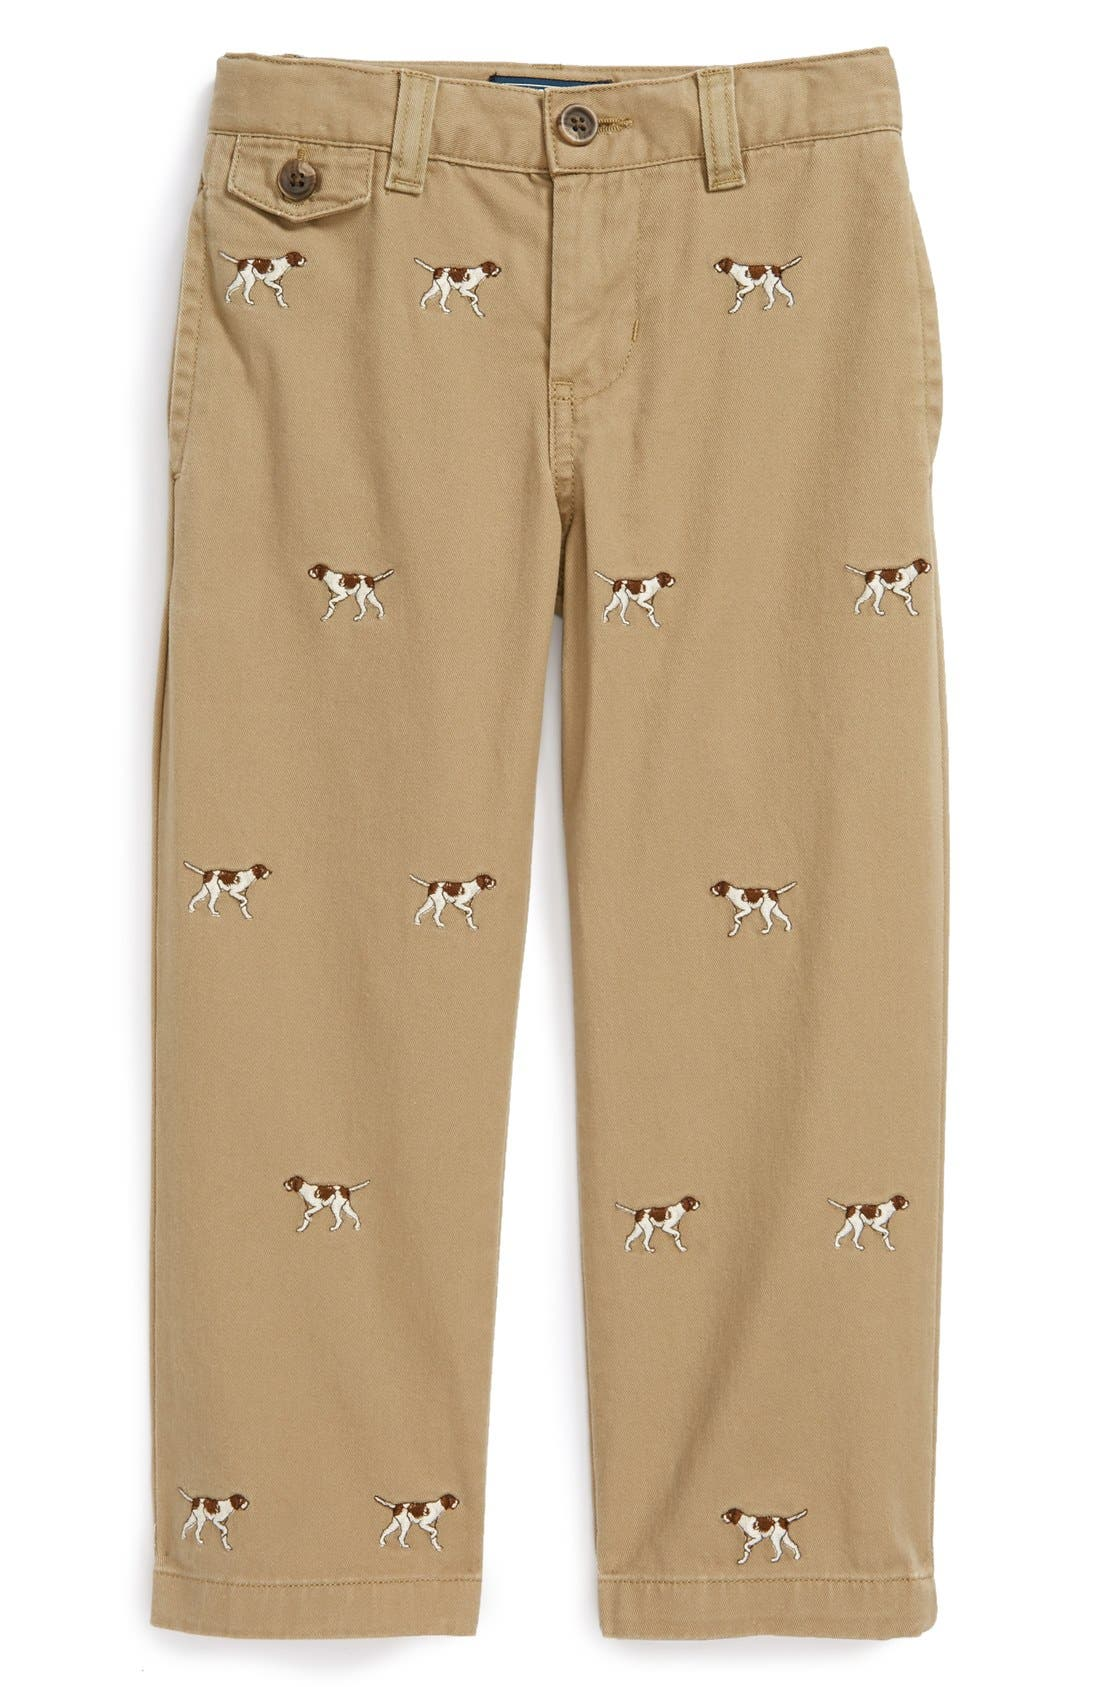 Alternate Image 1 Selected - Ralph Lauren Embroidered Straight Leg Pants (Toddler Boys)